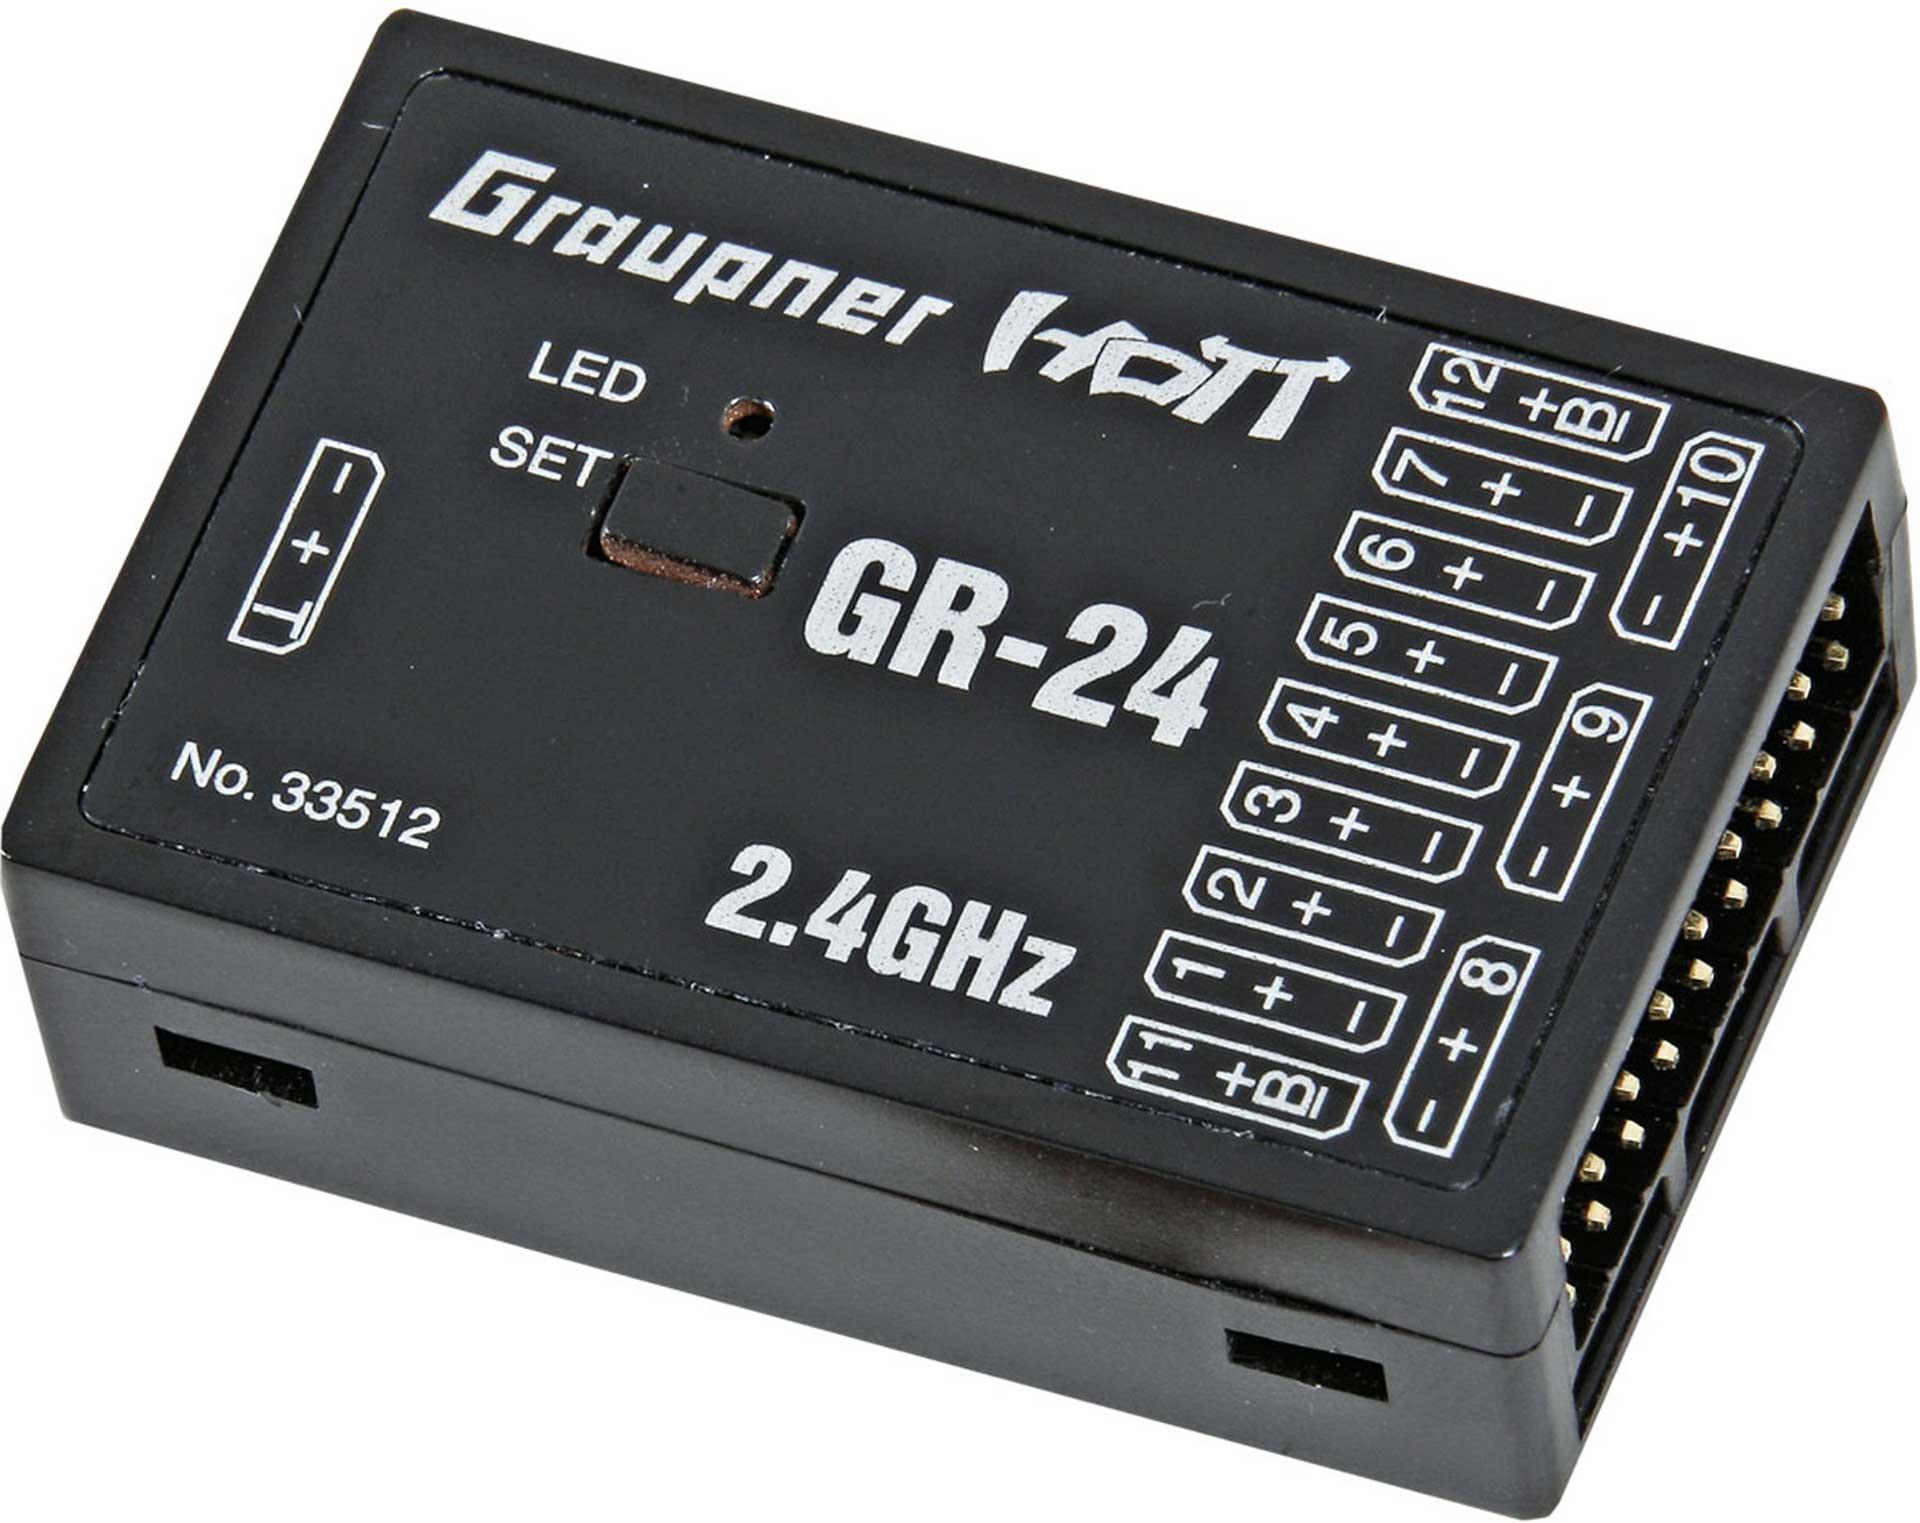 GRAUPNER GR-24 2.4GHZ HOTT 12K RECEIVER